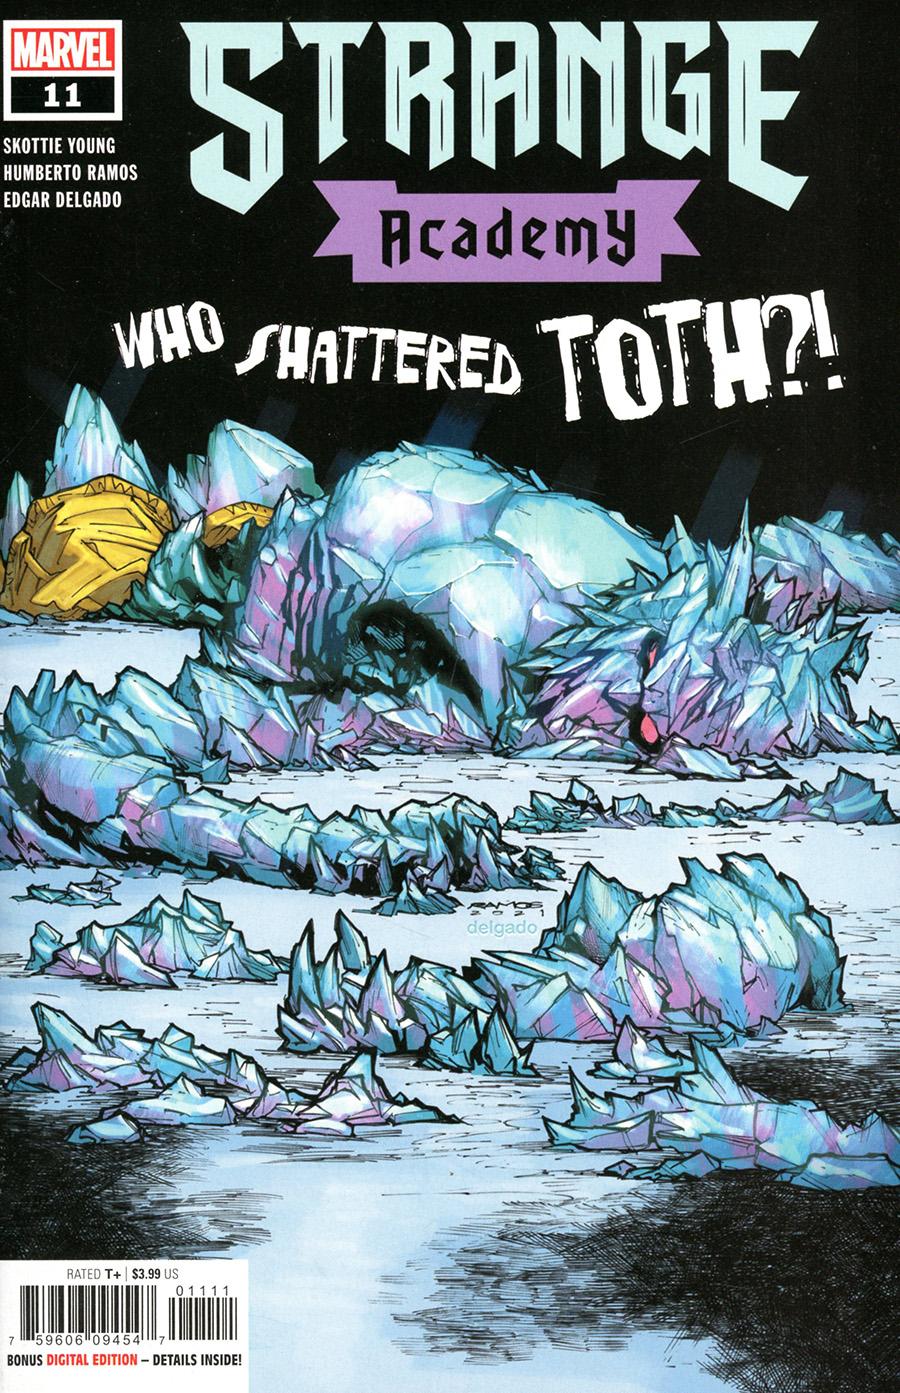 Strange Academy #11 Cover A Regular Humberto Ramos Cover